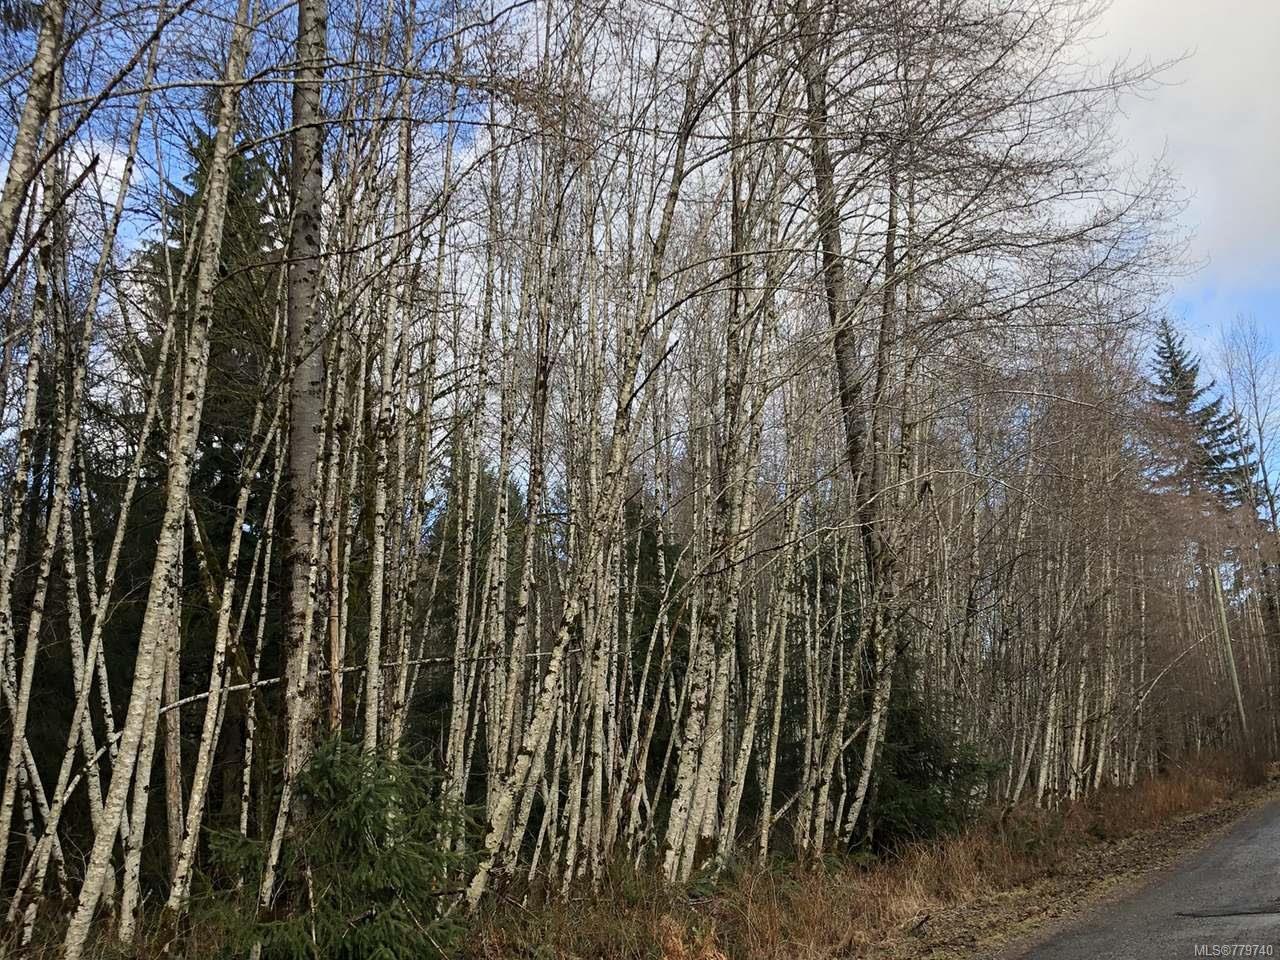 Main Photo: LT 13 PRENDERGAST ROAD in COURTENAY: CV Courtenay West Land for sale (Comox Valley)  : MLS®# 779740